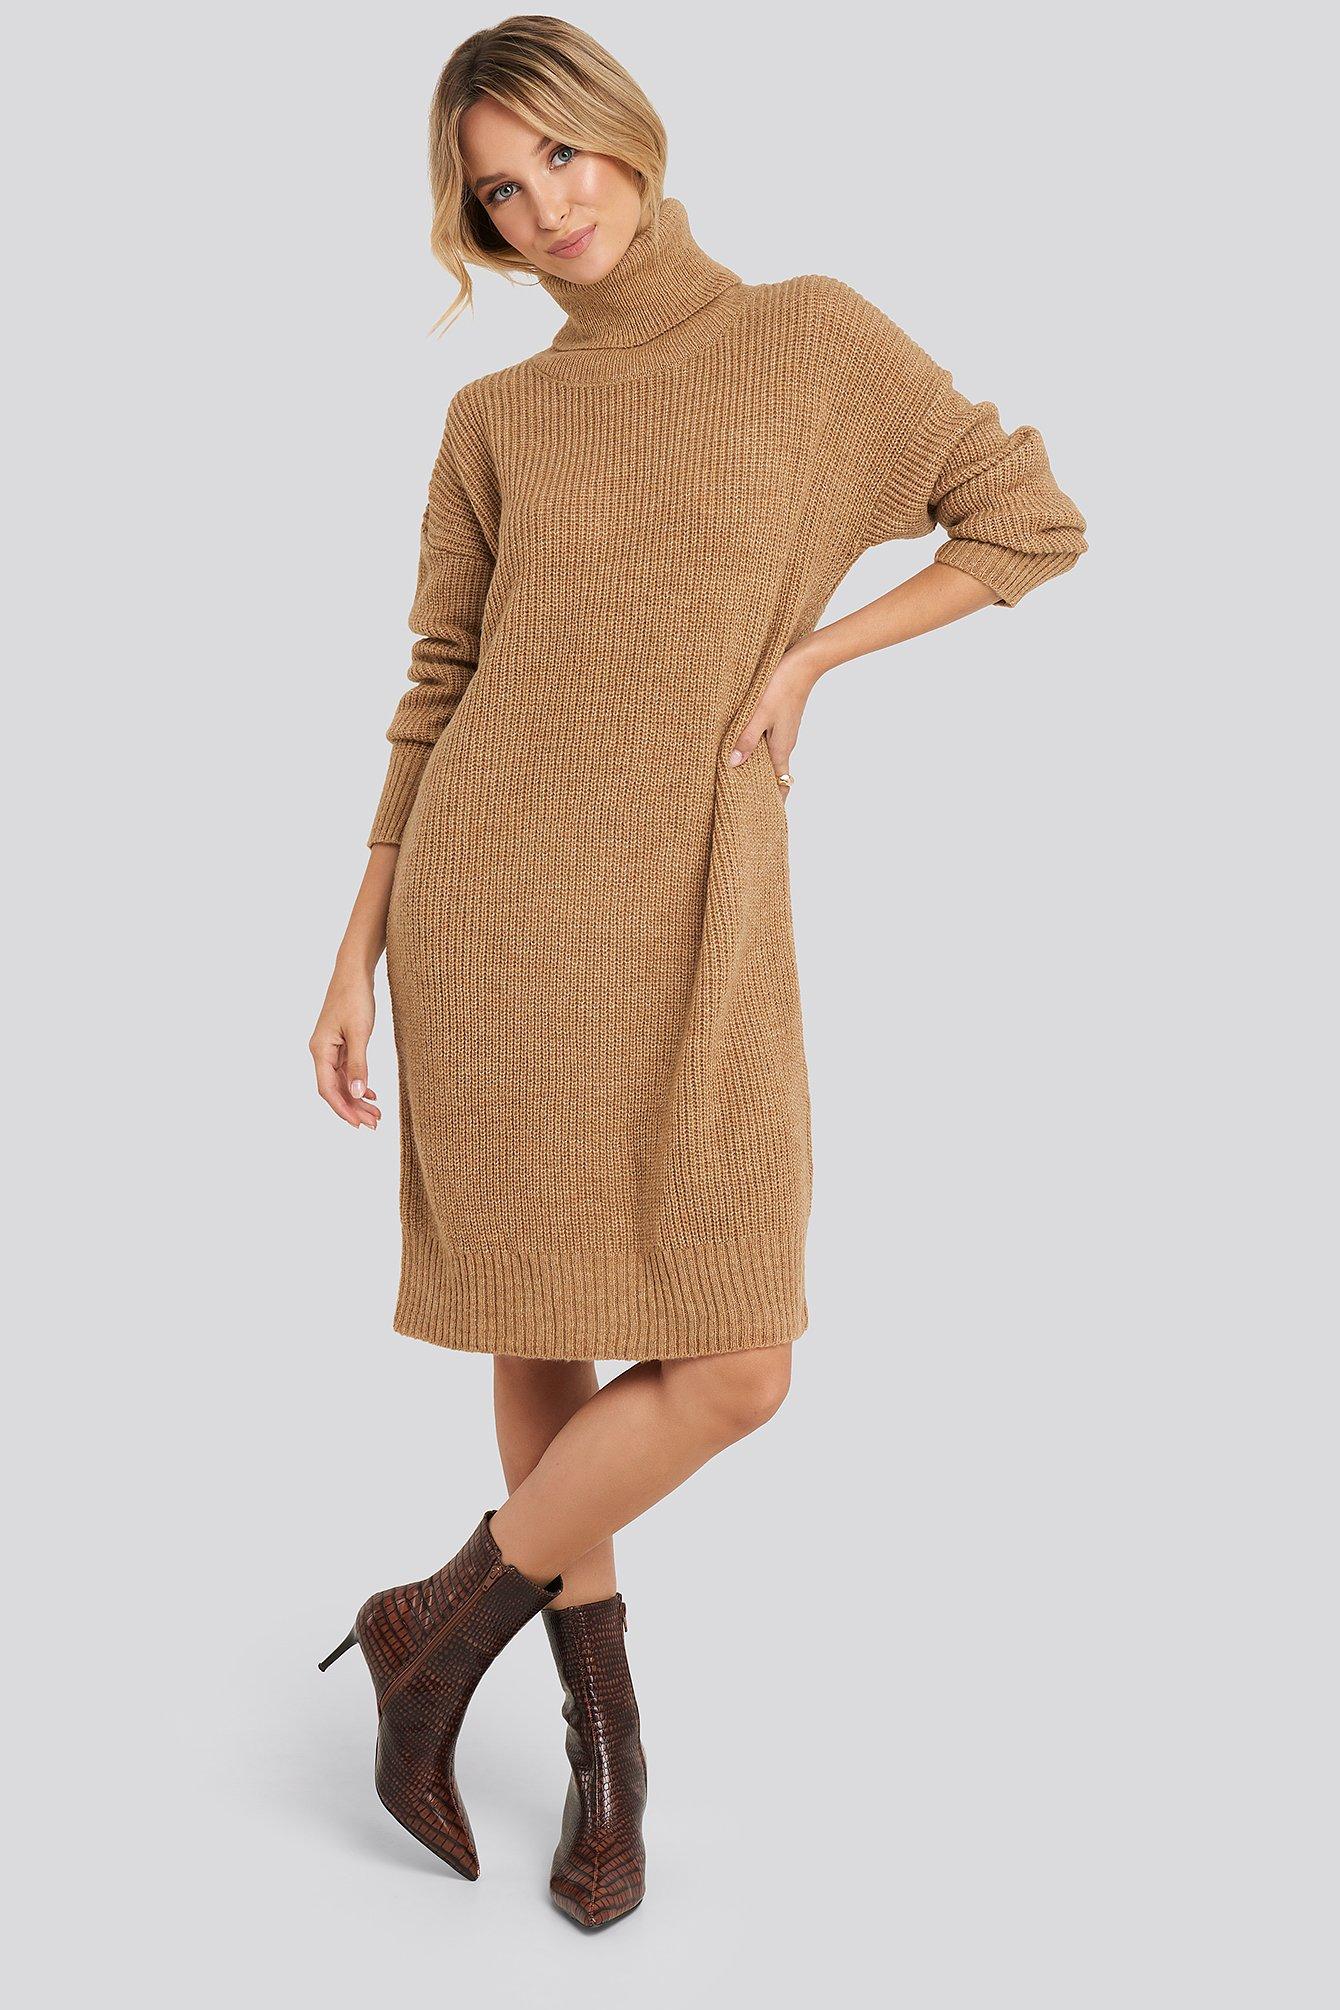 Turtleneck Oversize Knitted Dress Beige by Trendyol